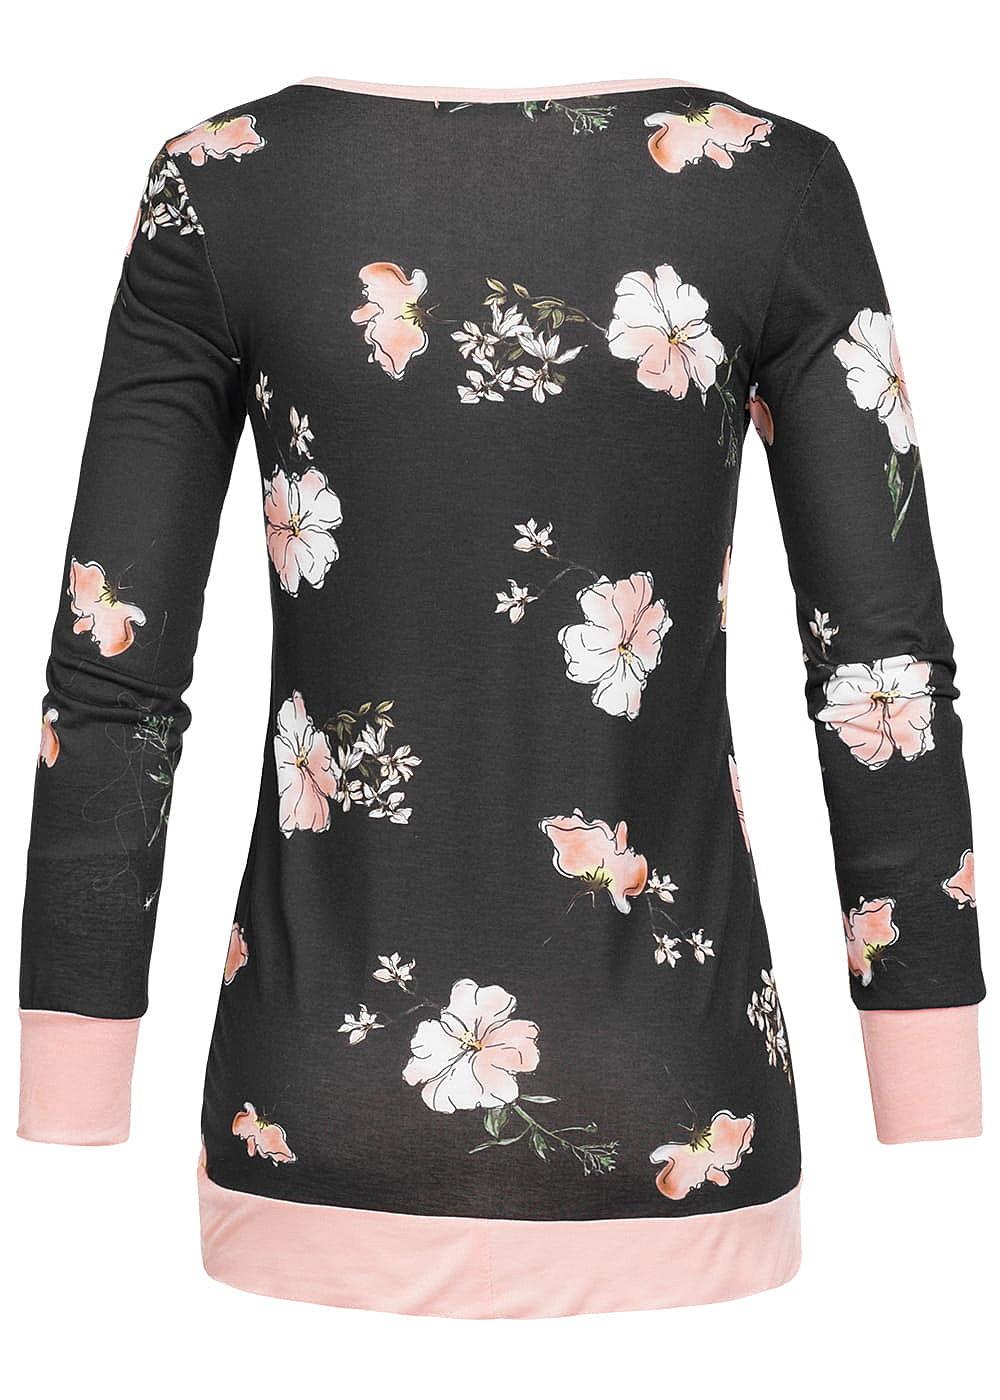 styleboom fashion damen longsleeve blumen muster schwarz pink 77onlineshop. Black Bedroom Furniture Sets. Home Design Ideas